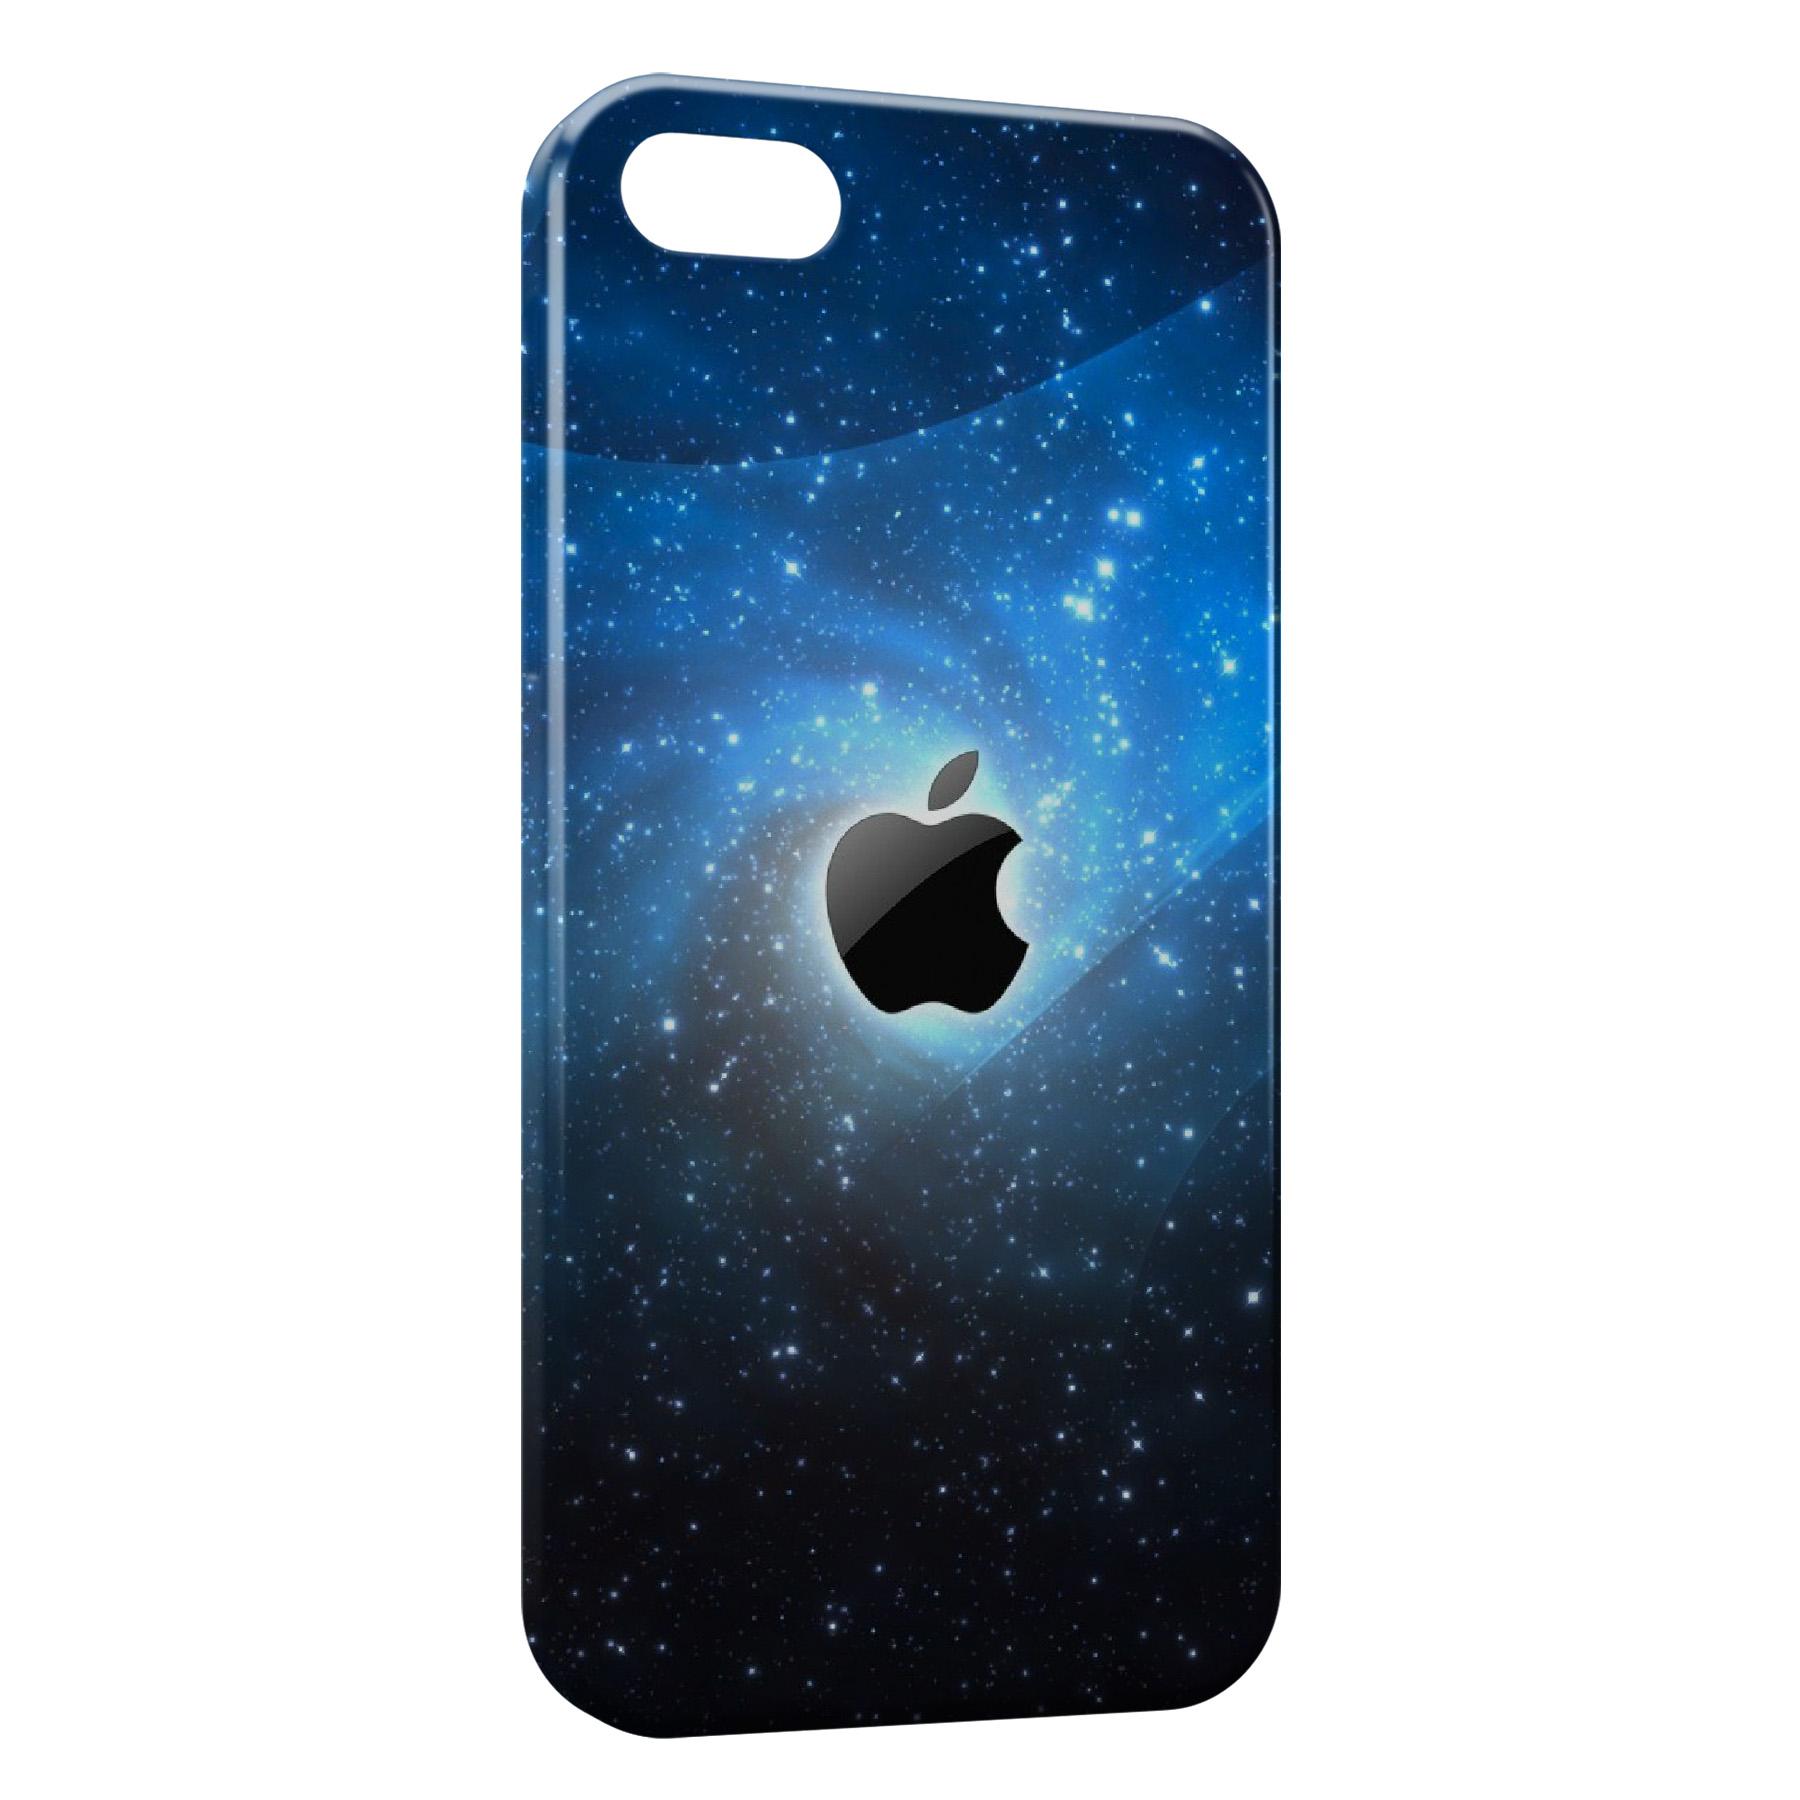 Coque iPhone 6 Plus 6S Plus Apple Galaxy Style